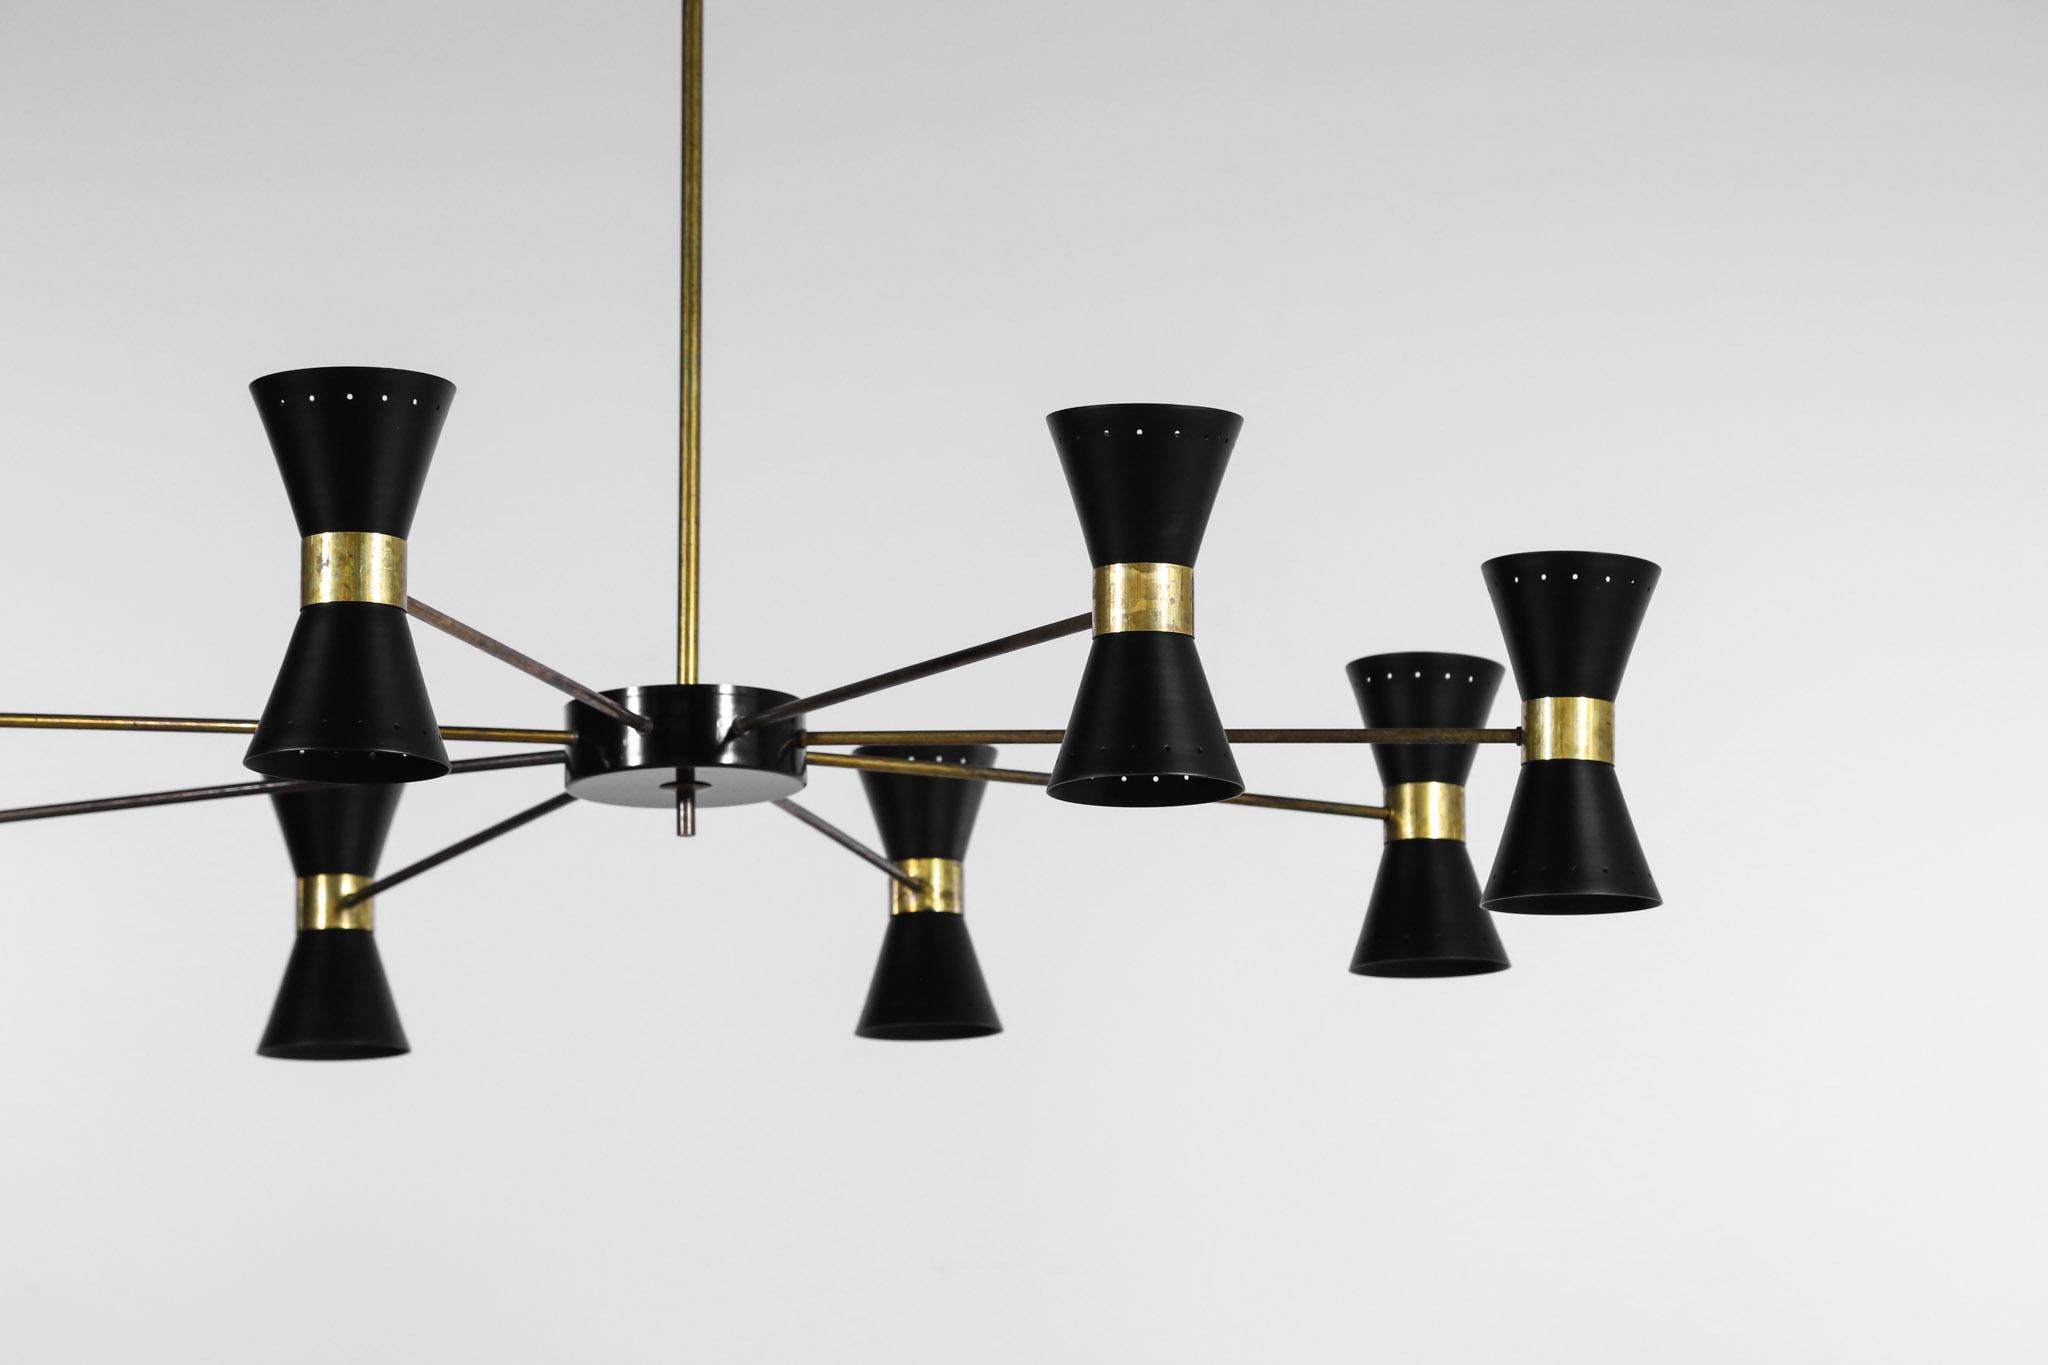 grand lustre italien moderne diabolo noir 8 branches danke galerie. Black Bedroom Furniture Sets. Home Design Ideas